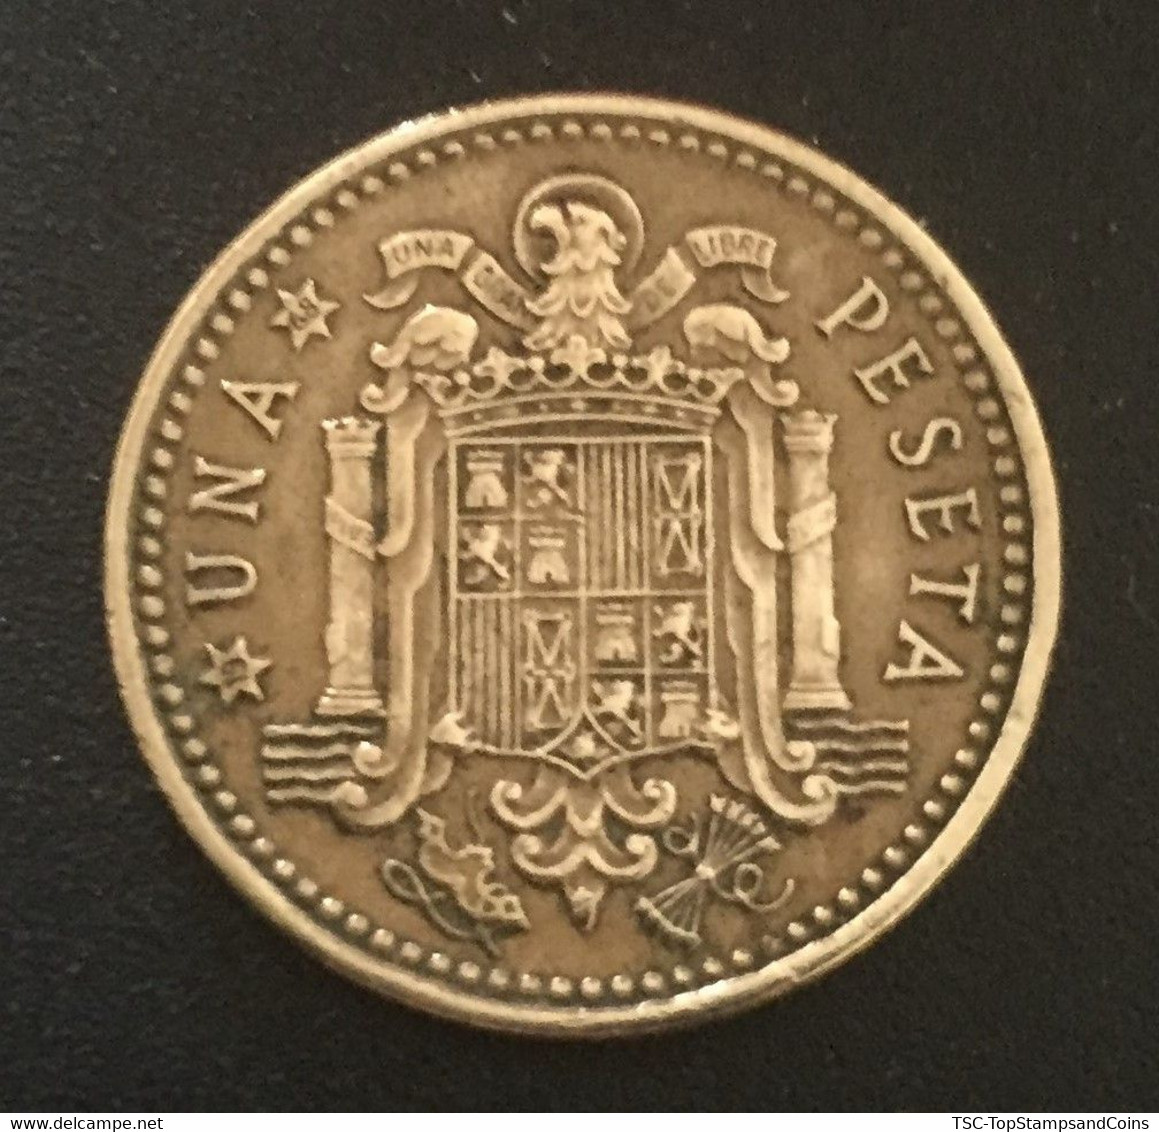 $$ESP1003-Francisco Franco 1 Peseta Coin - Spain - 1966 - 1 Peseta